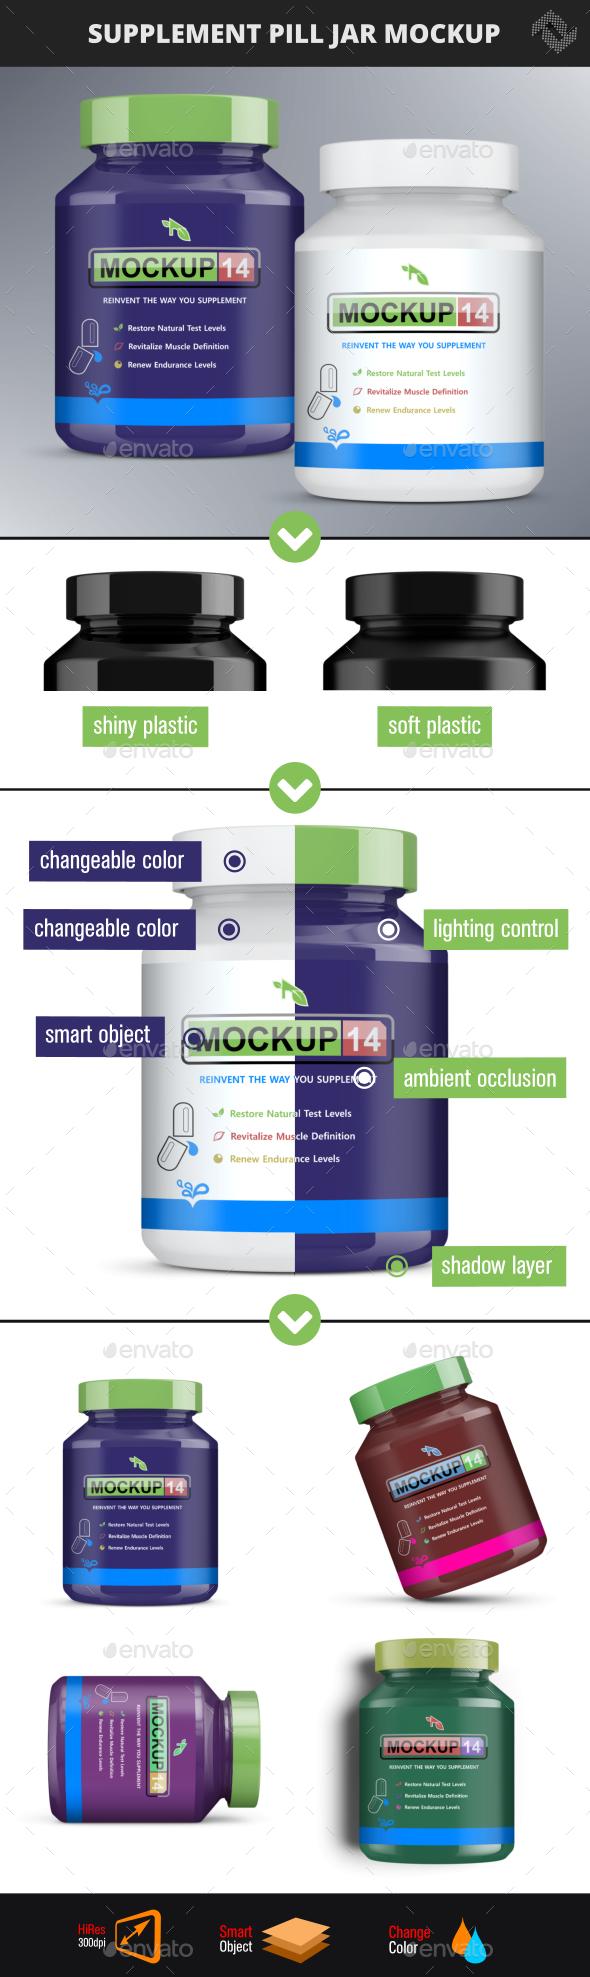 Supplement Pill Bottle Mockup - Packaging Product Mock-Ups